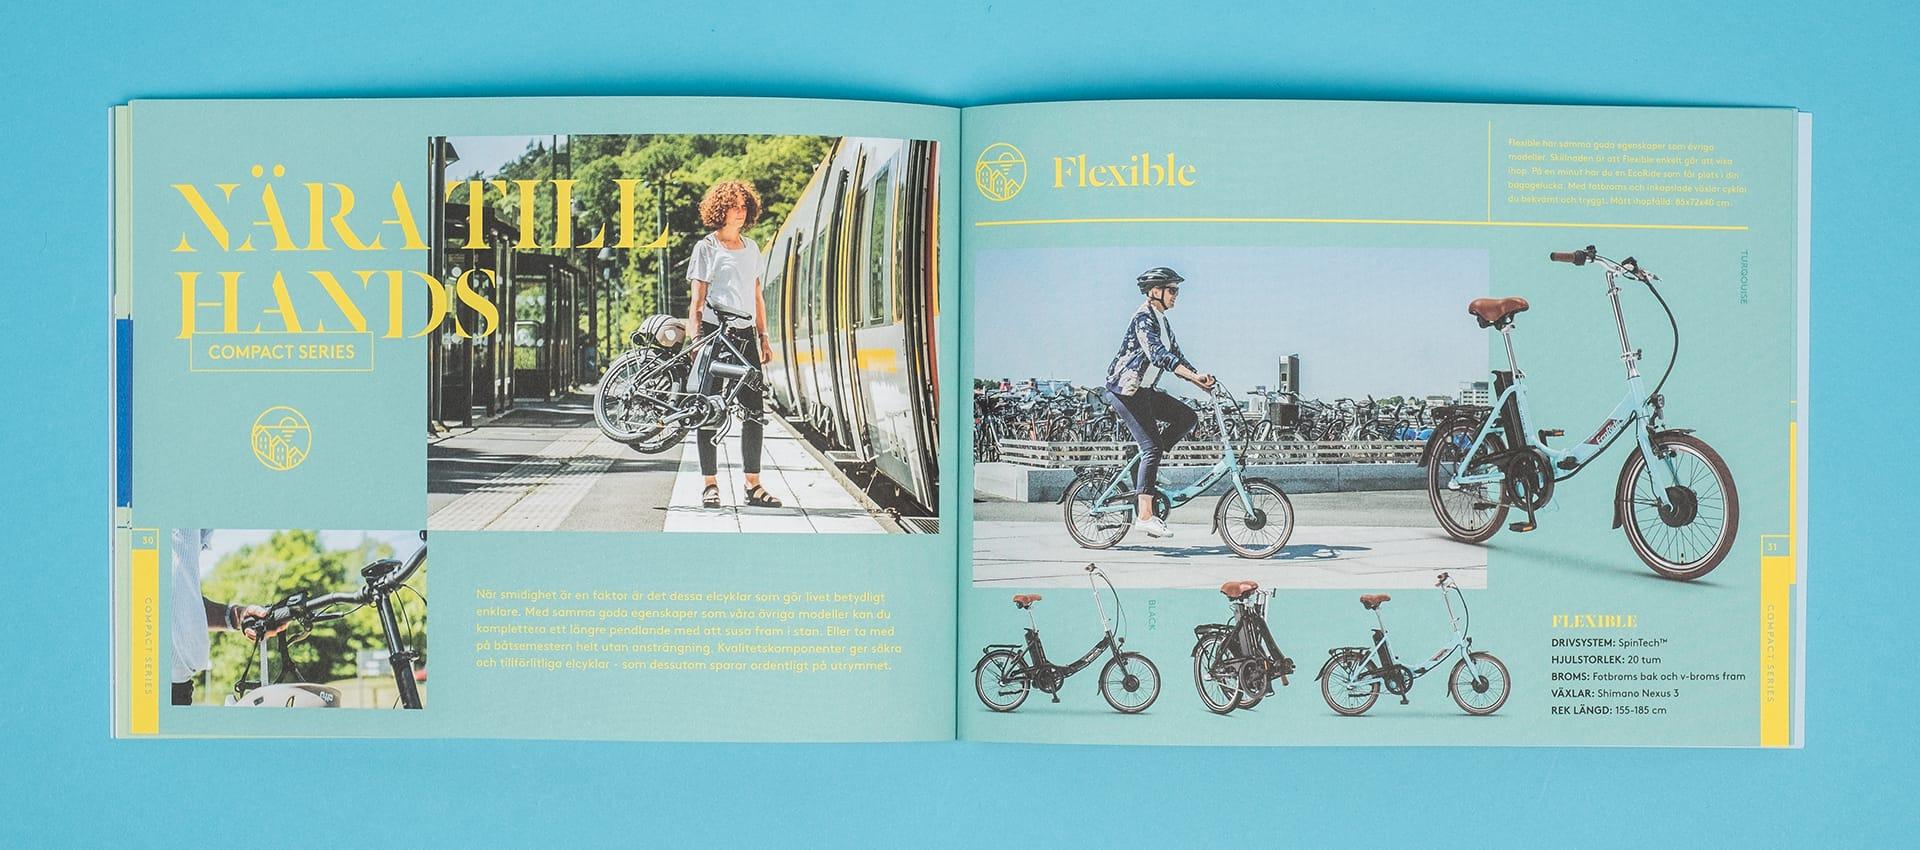 Ecoride-Print-Design-mnecander-6